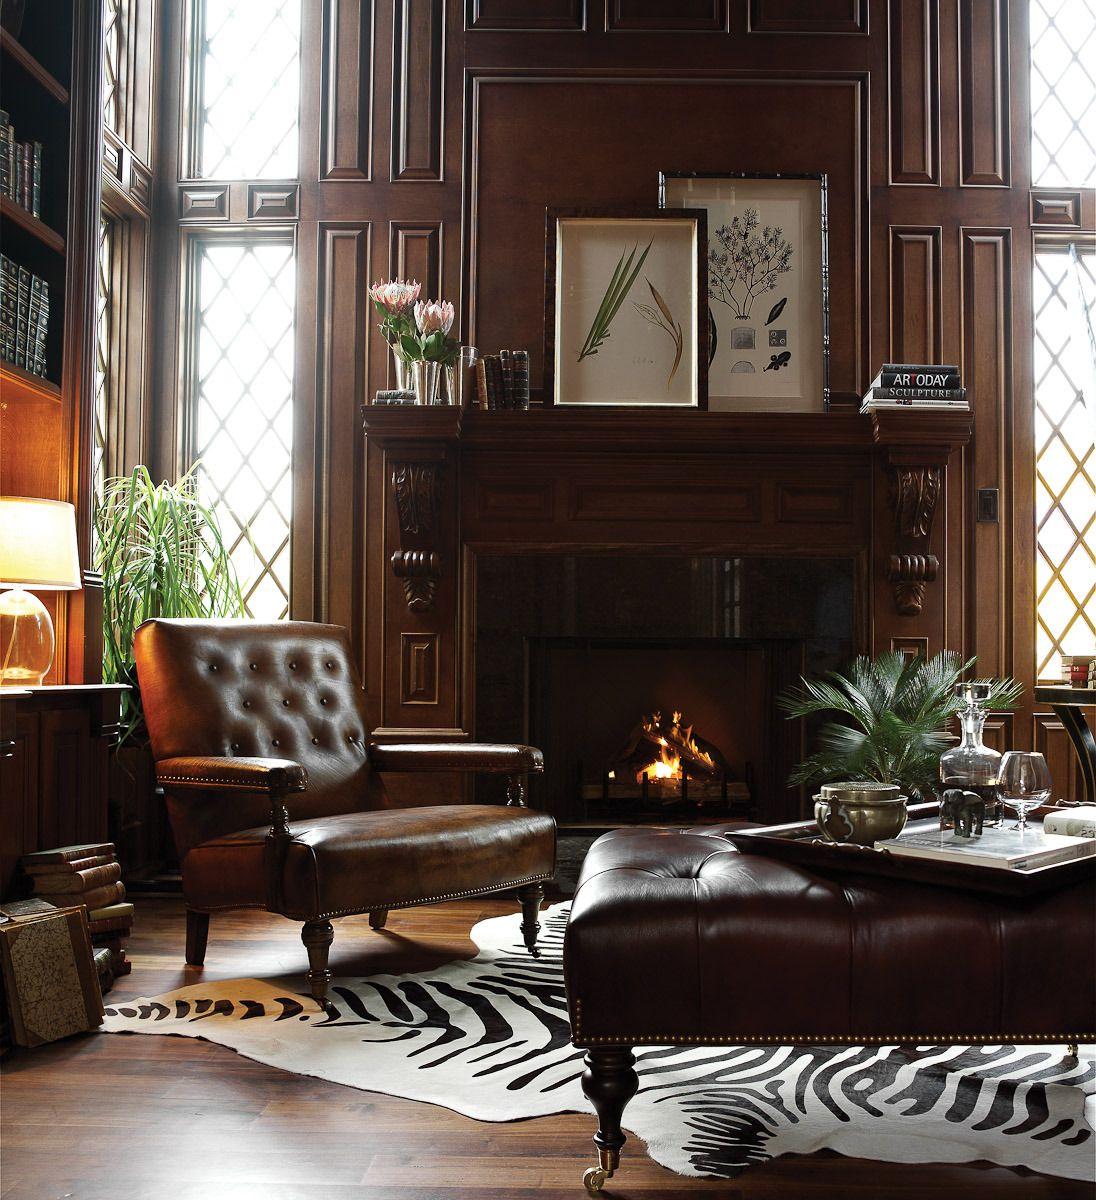 Furniture Meubles Hancock And Moore Furniture Aristocratic Atmosphere Luxury Furniture Design Living Room Leather Bedroom Design